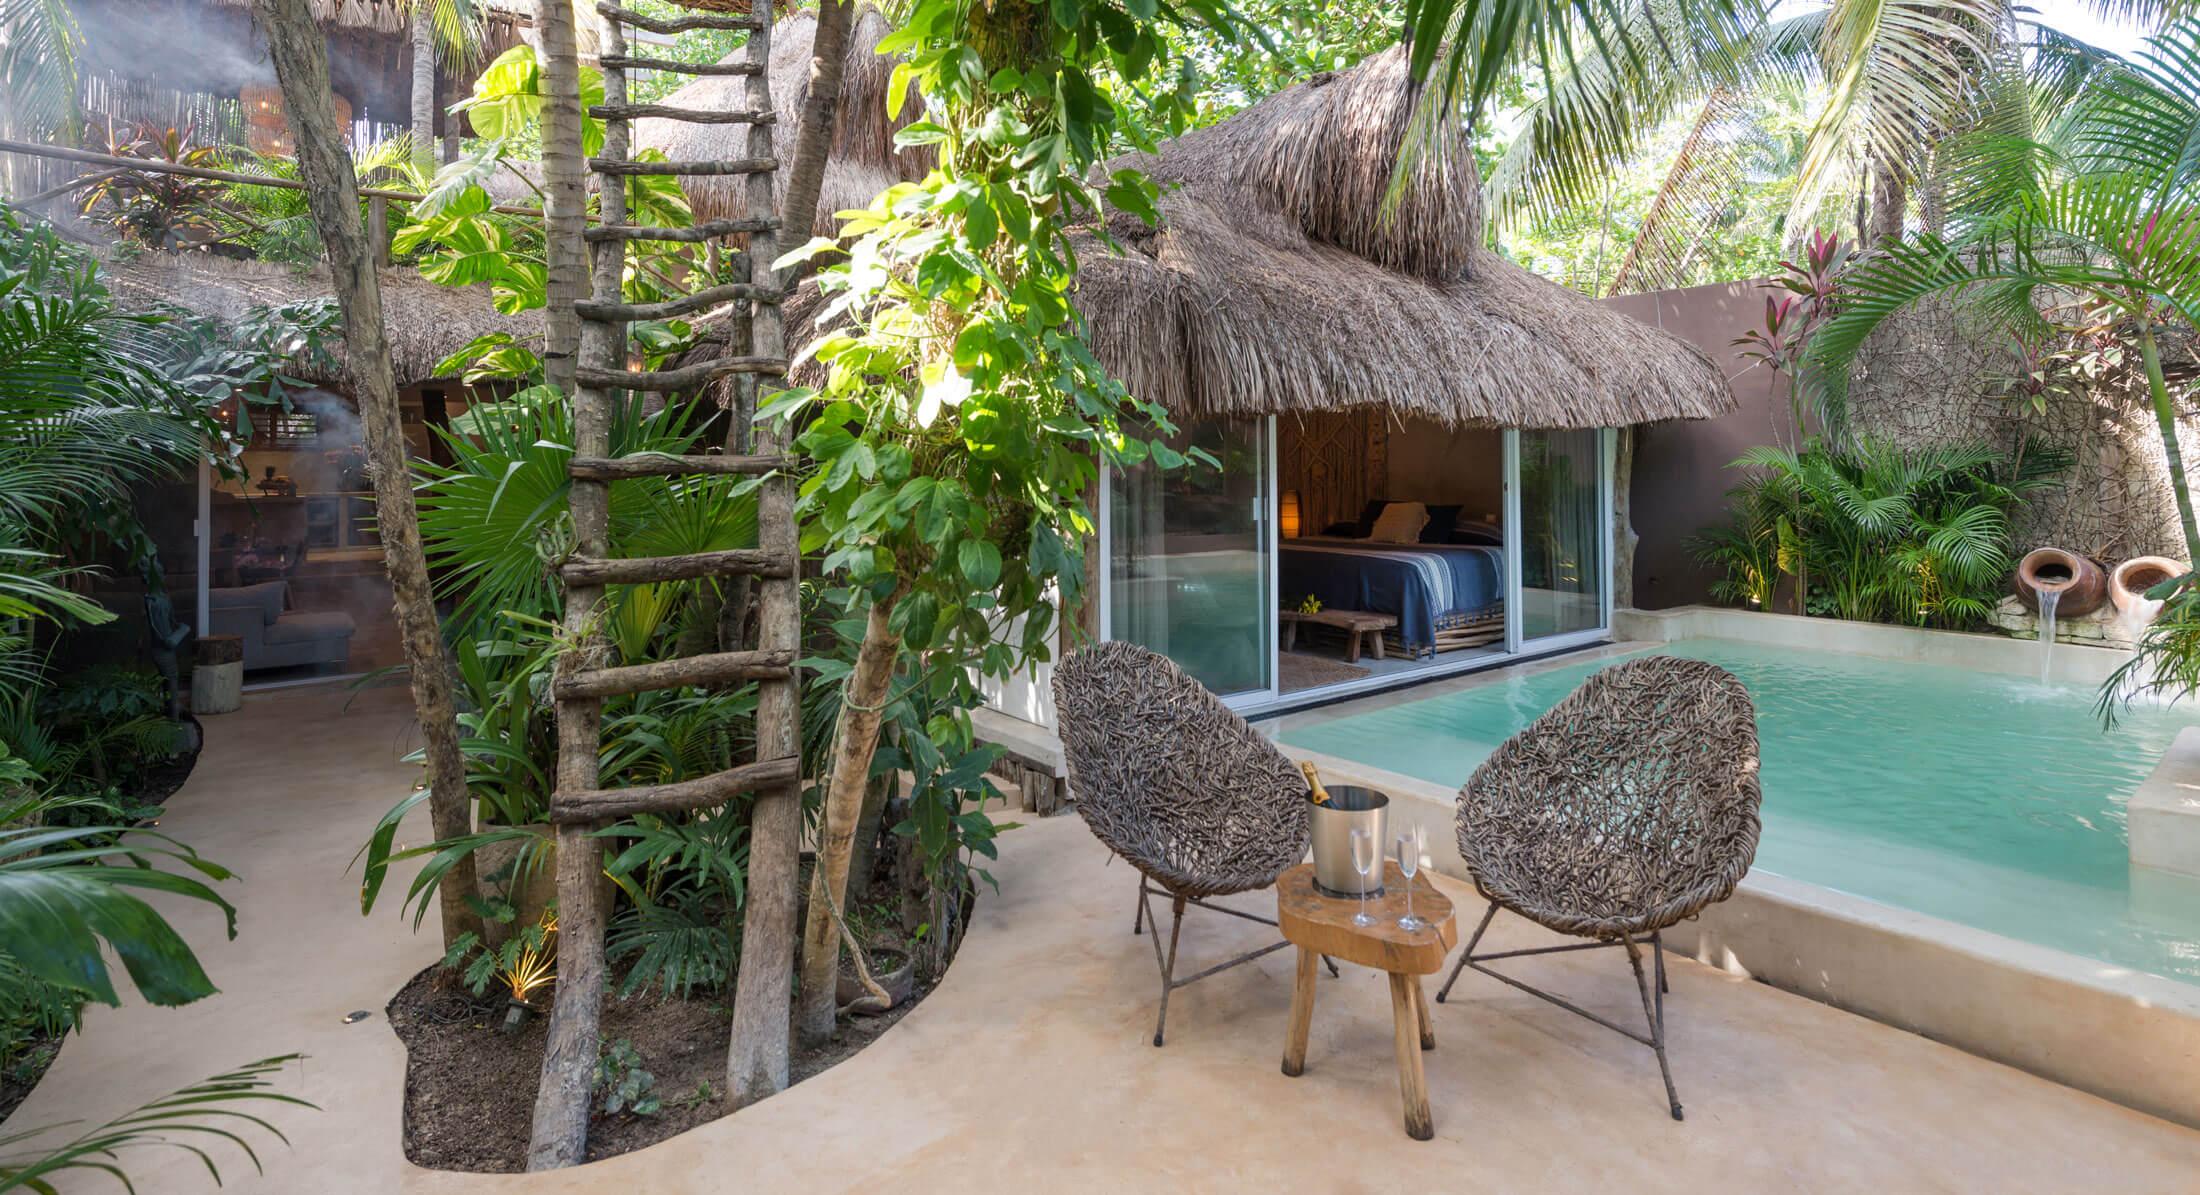 Maya_Luxe_Riviera_Maya_Luxury_Vacations_Villa_Rentals_Tulum_Playa_del_Carmen_Mexico_Bejuco_House_1.jpg